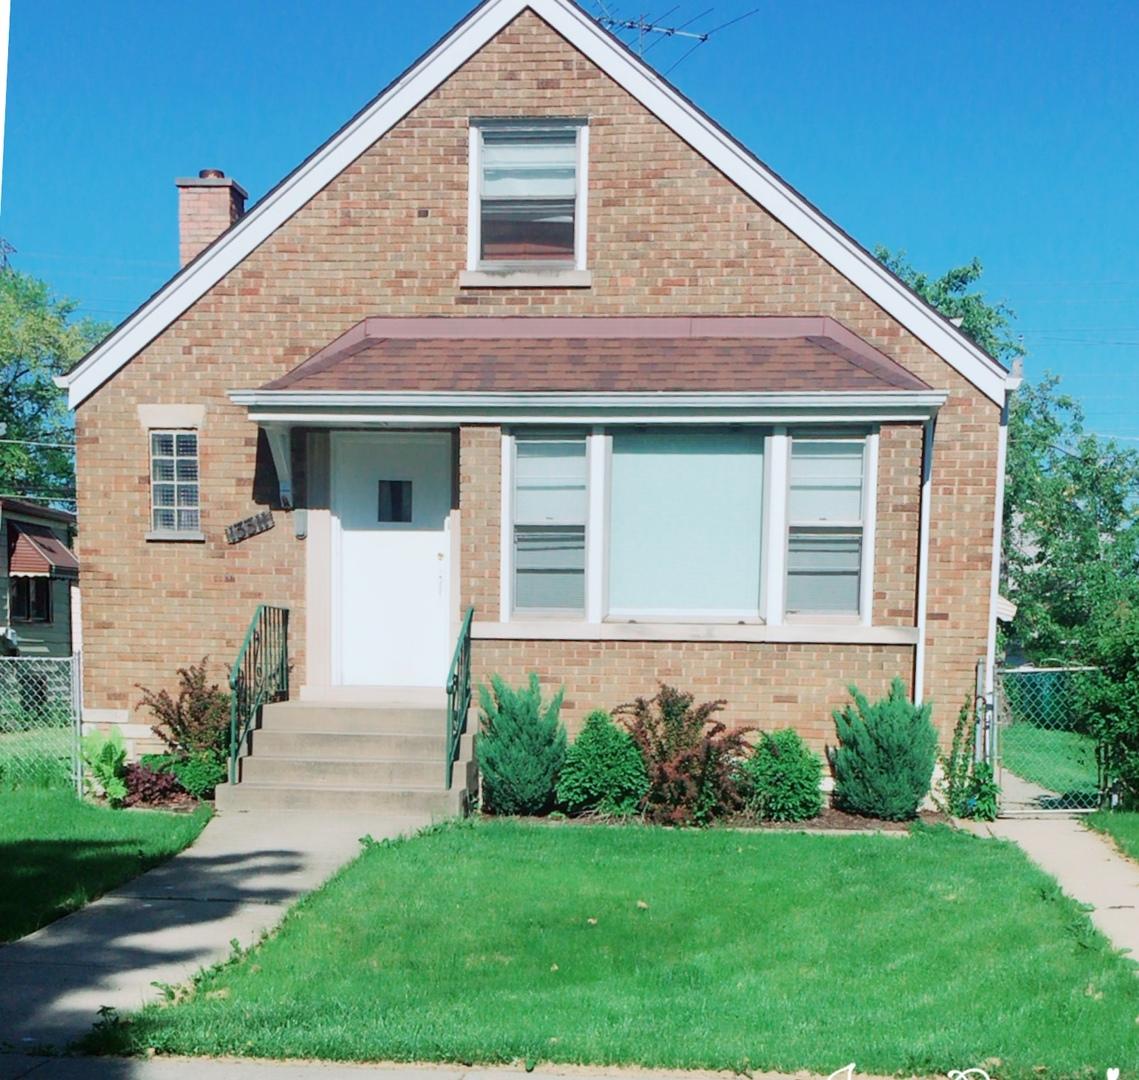 13311 Buffalo ,Chicago, Illinois 60633